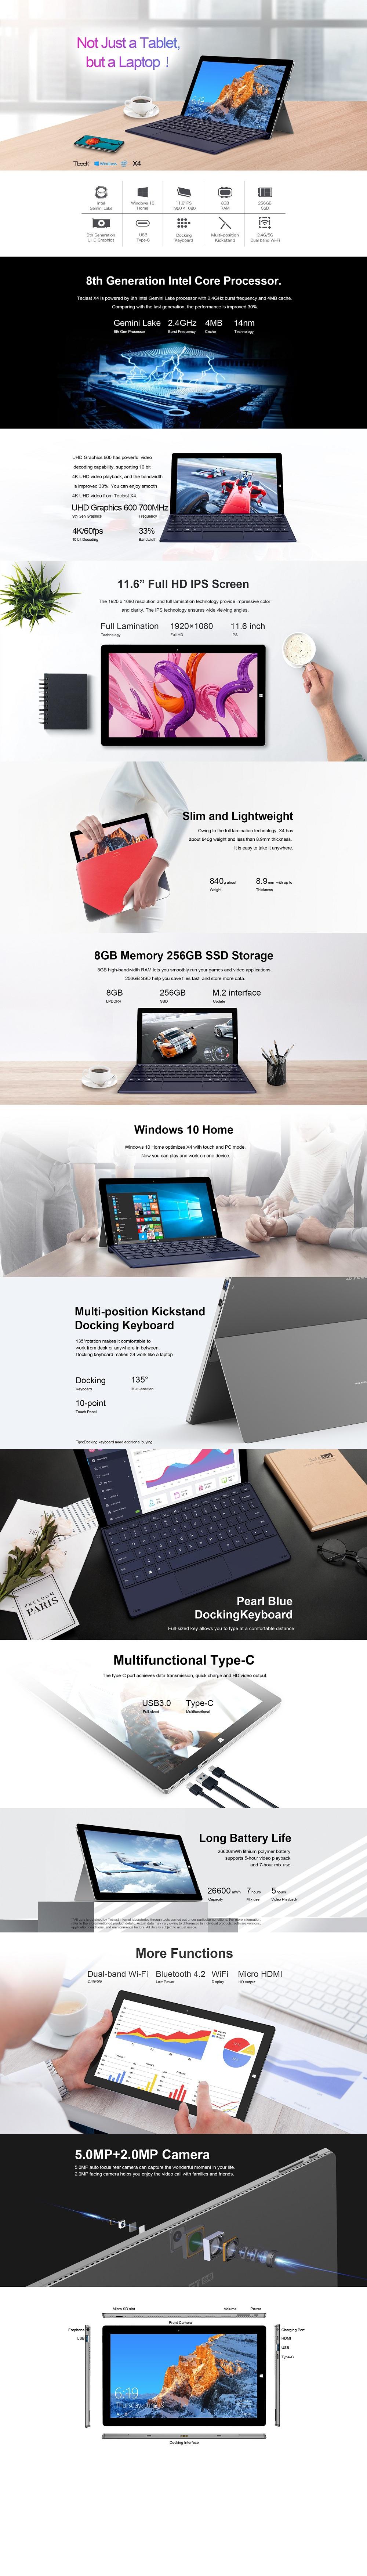 Teclast X4 2 in 1 Tablet Laptop 11.6 inch Windows 10 Celeron N4100 Quad Core 1.10GHz 8GB RAM 256GB SSD 2.0MP Front 5.0MP Camera HDMI with Keyboard- Silver 8GB+256GB